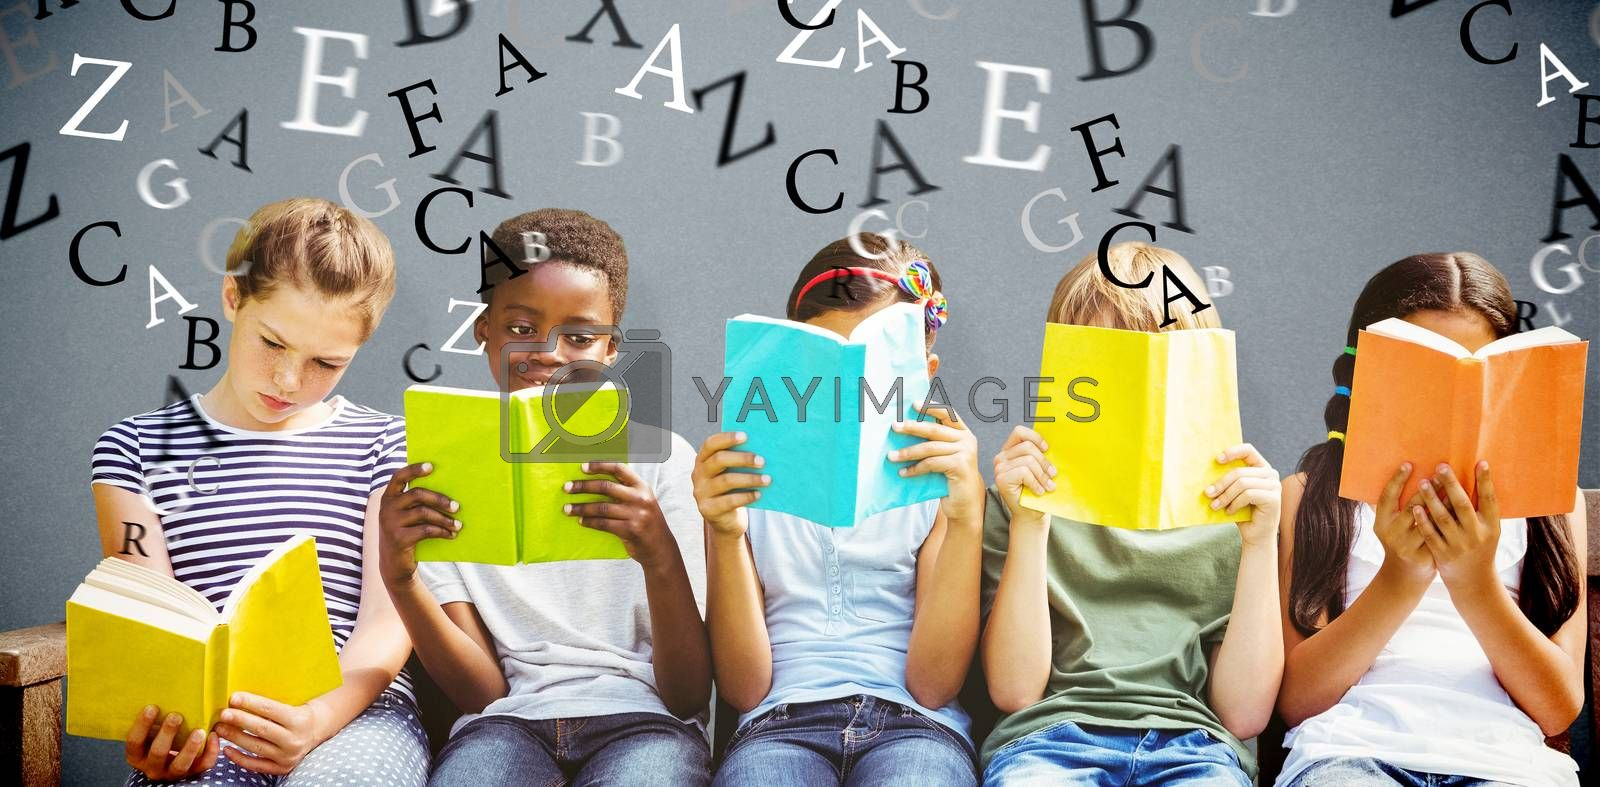 Children reading books at park against grey background